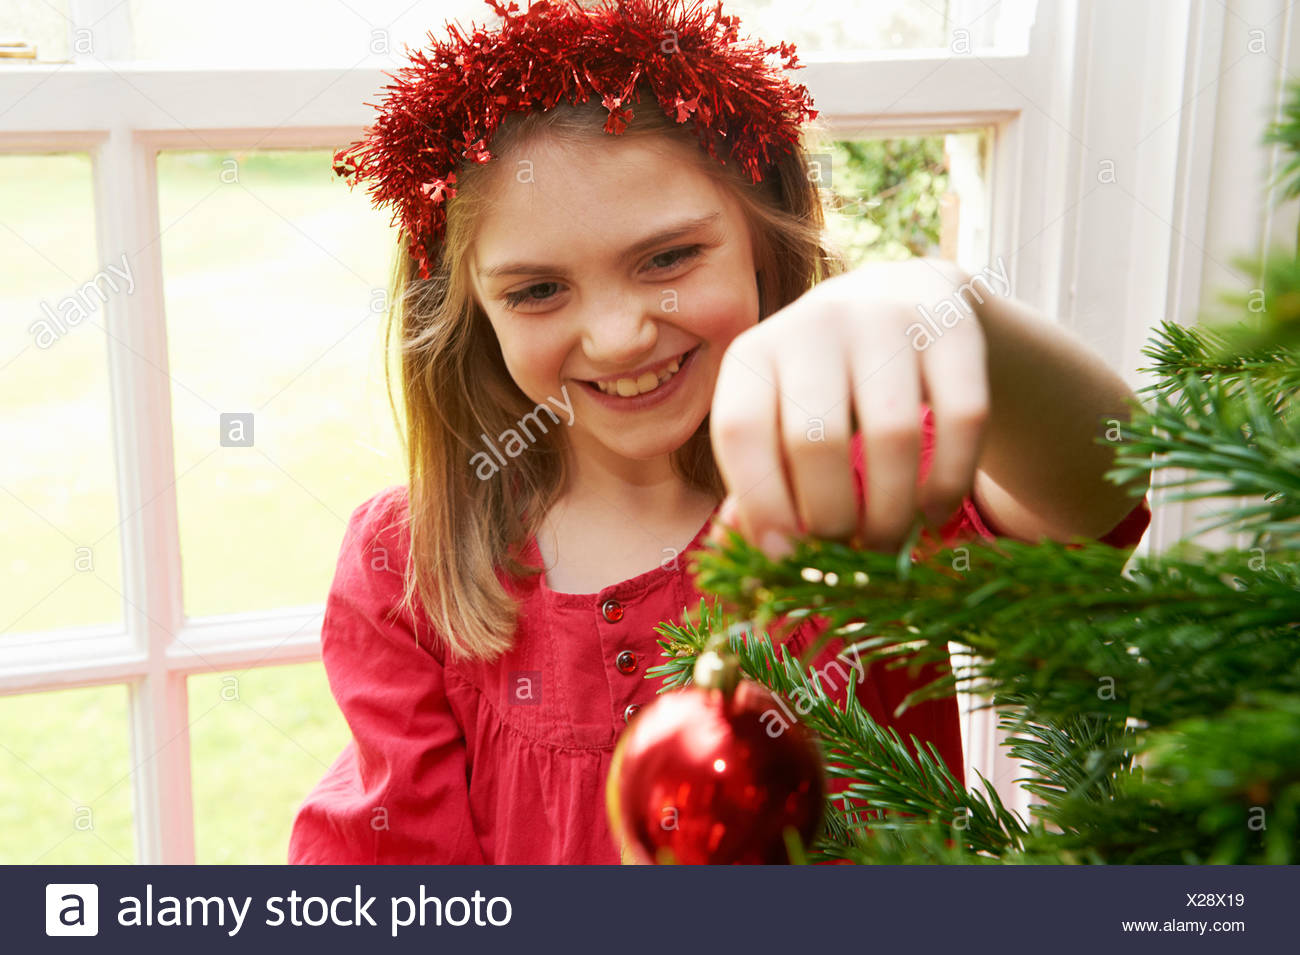 Girl decorating Christmas tree - Stock Image